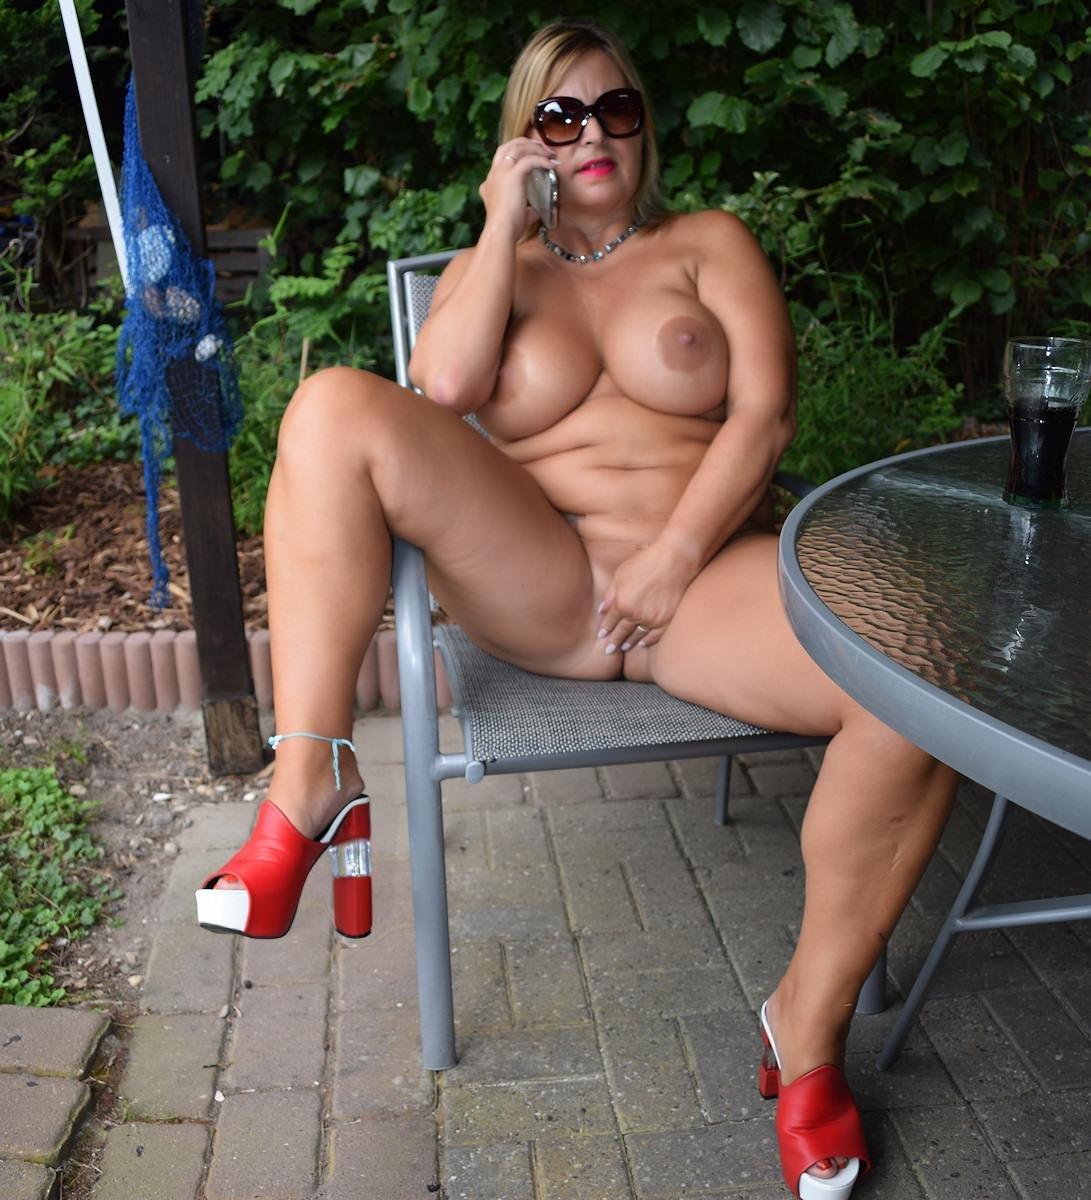 Check out my sexy new blogpost! 6FdhKJl8BF fj9nCXtrln